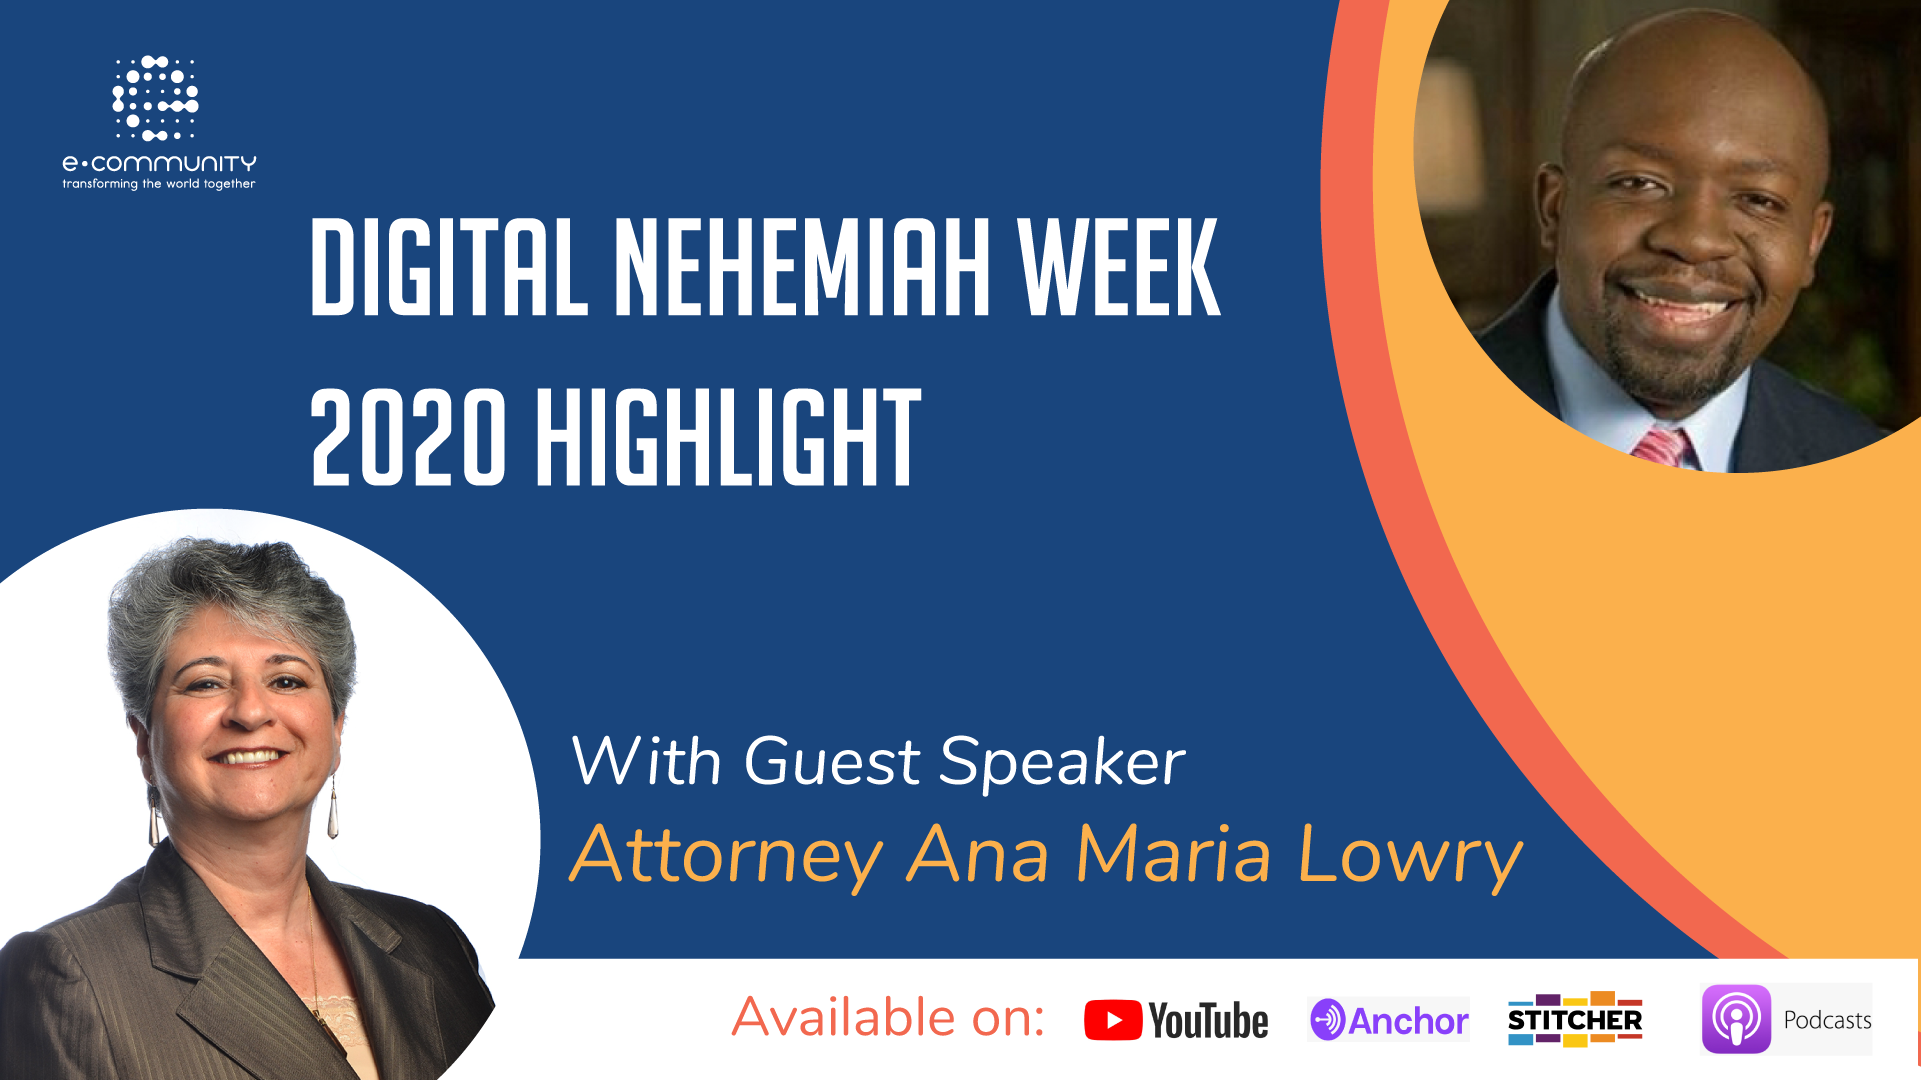 Digital Nehemiah Week 2020 Highlight Host Patrice Tsague with Atty Ana Maria Lowry